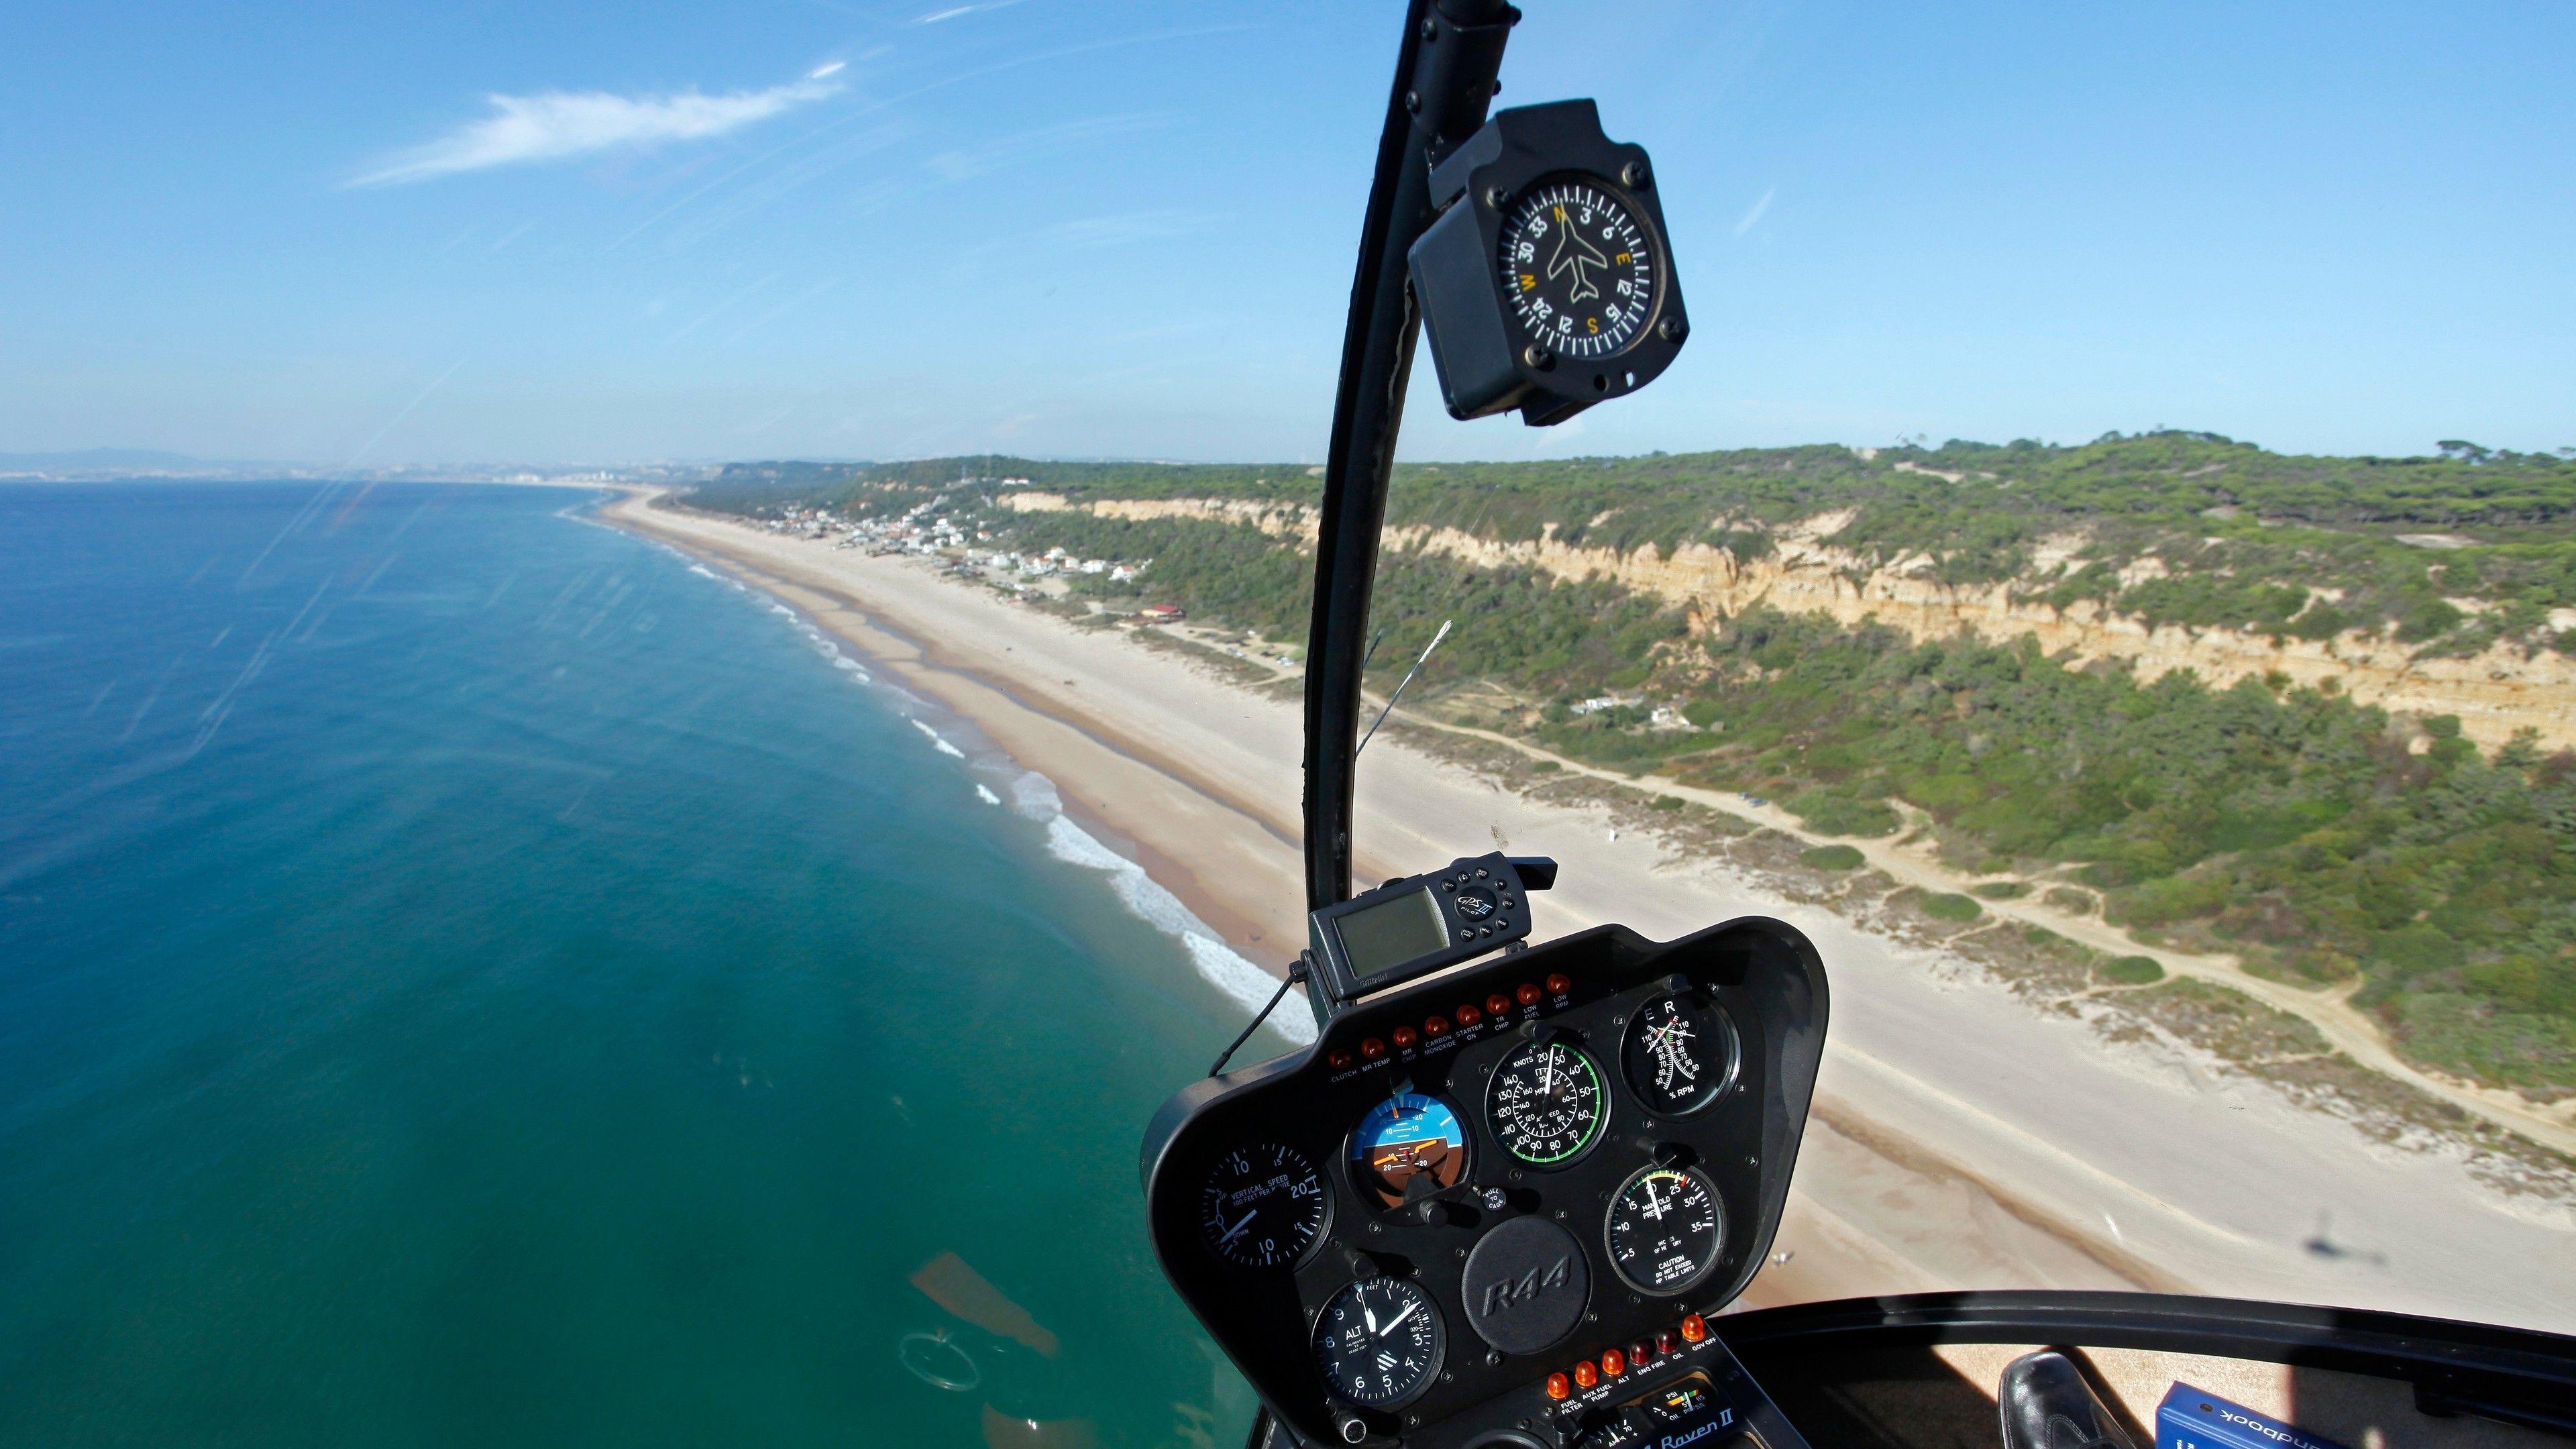 LisbonHelicopters_084_AndreGarcez.jpg